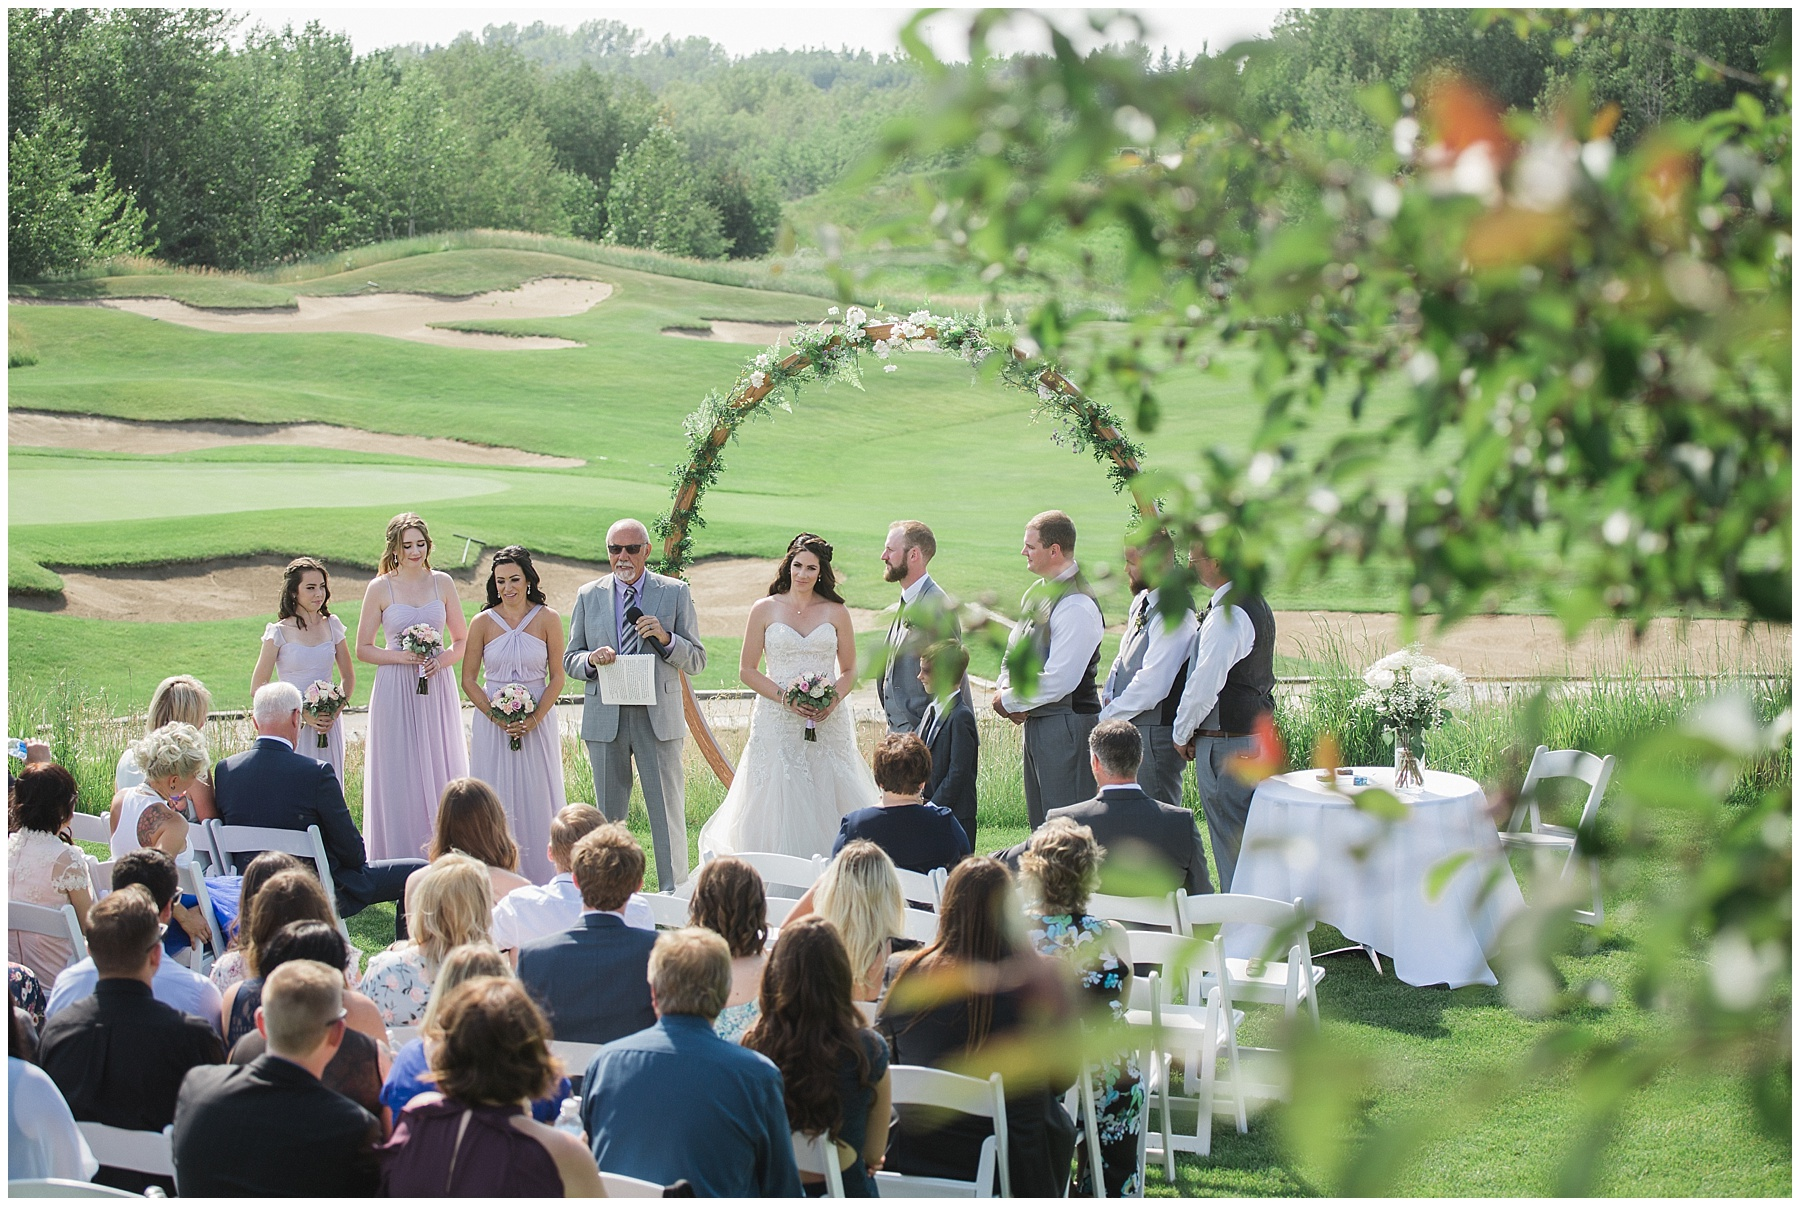 Calgary_Wedding_Photography_Carnmoney_Golf_Club_04.jpg